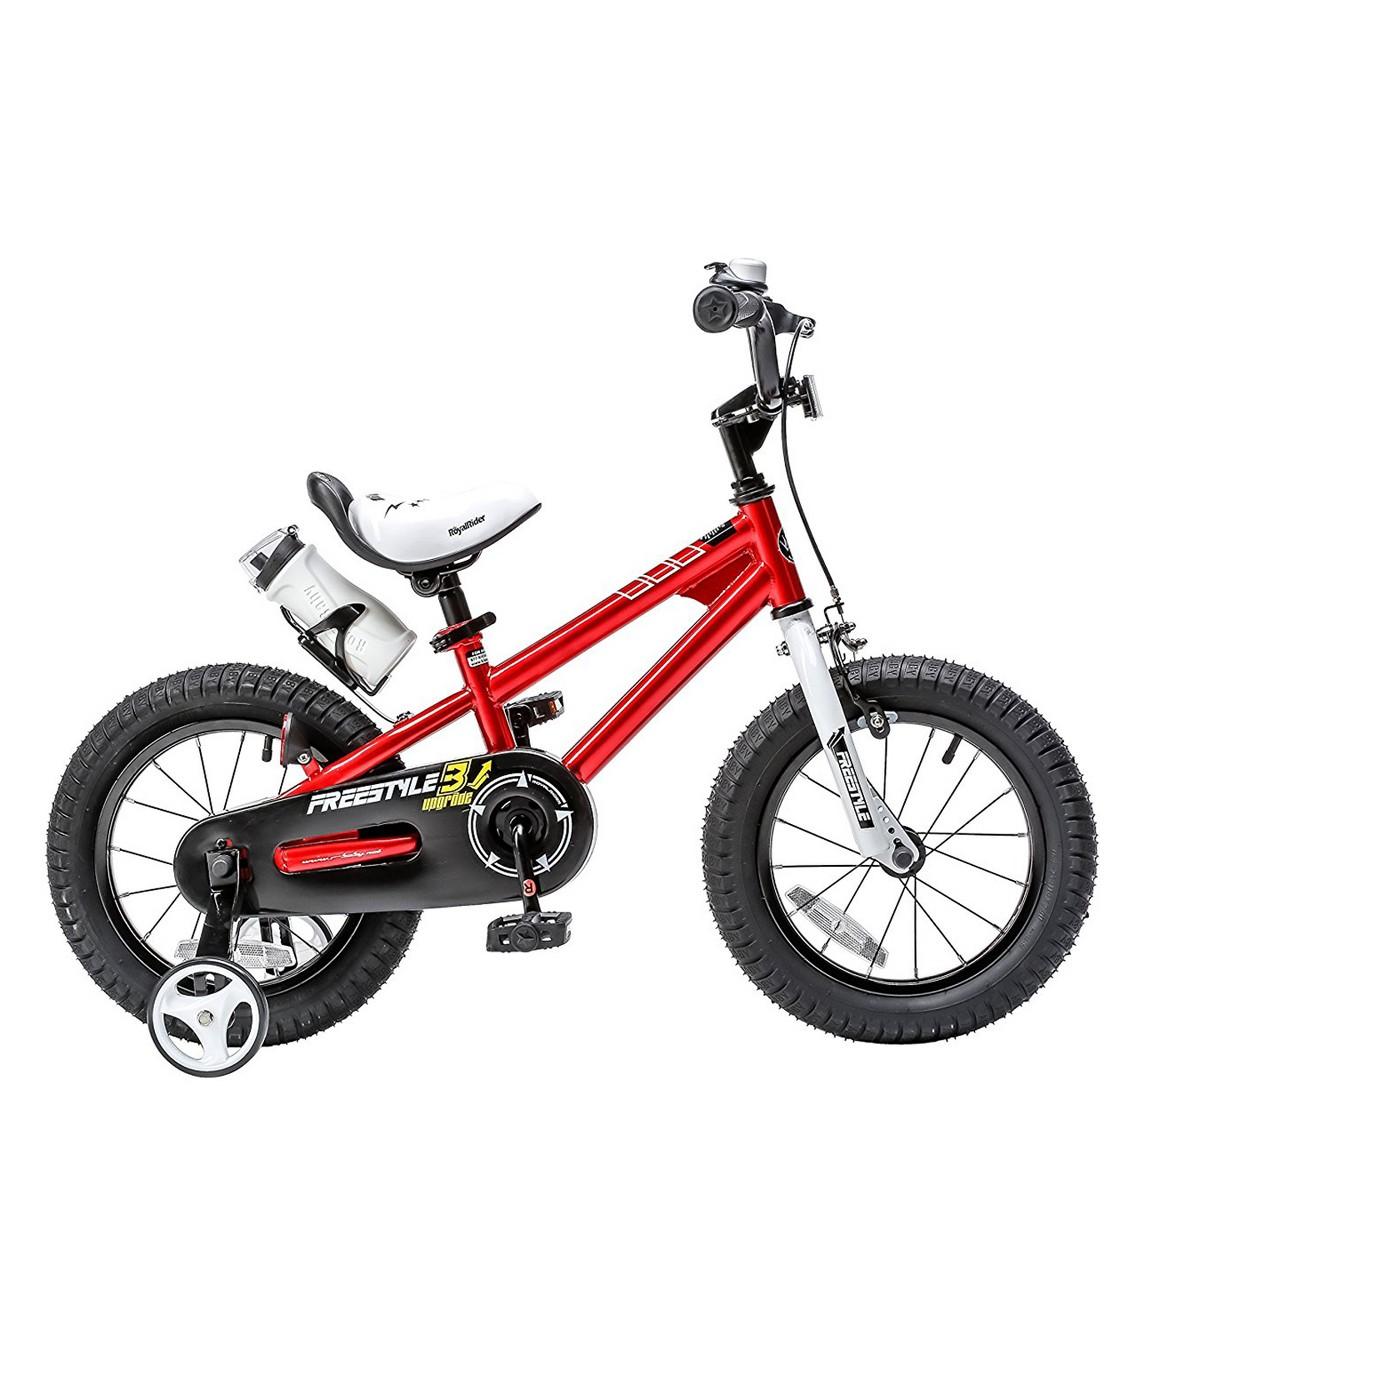 "RoyalBaby Kids Freestyle 16"" Red BMX Bike $75.99 + Free Shipping"